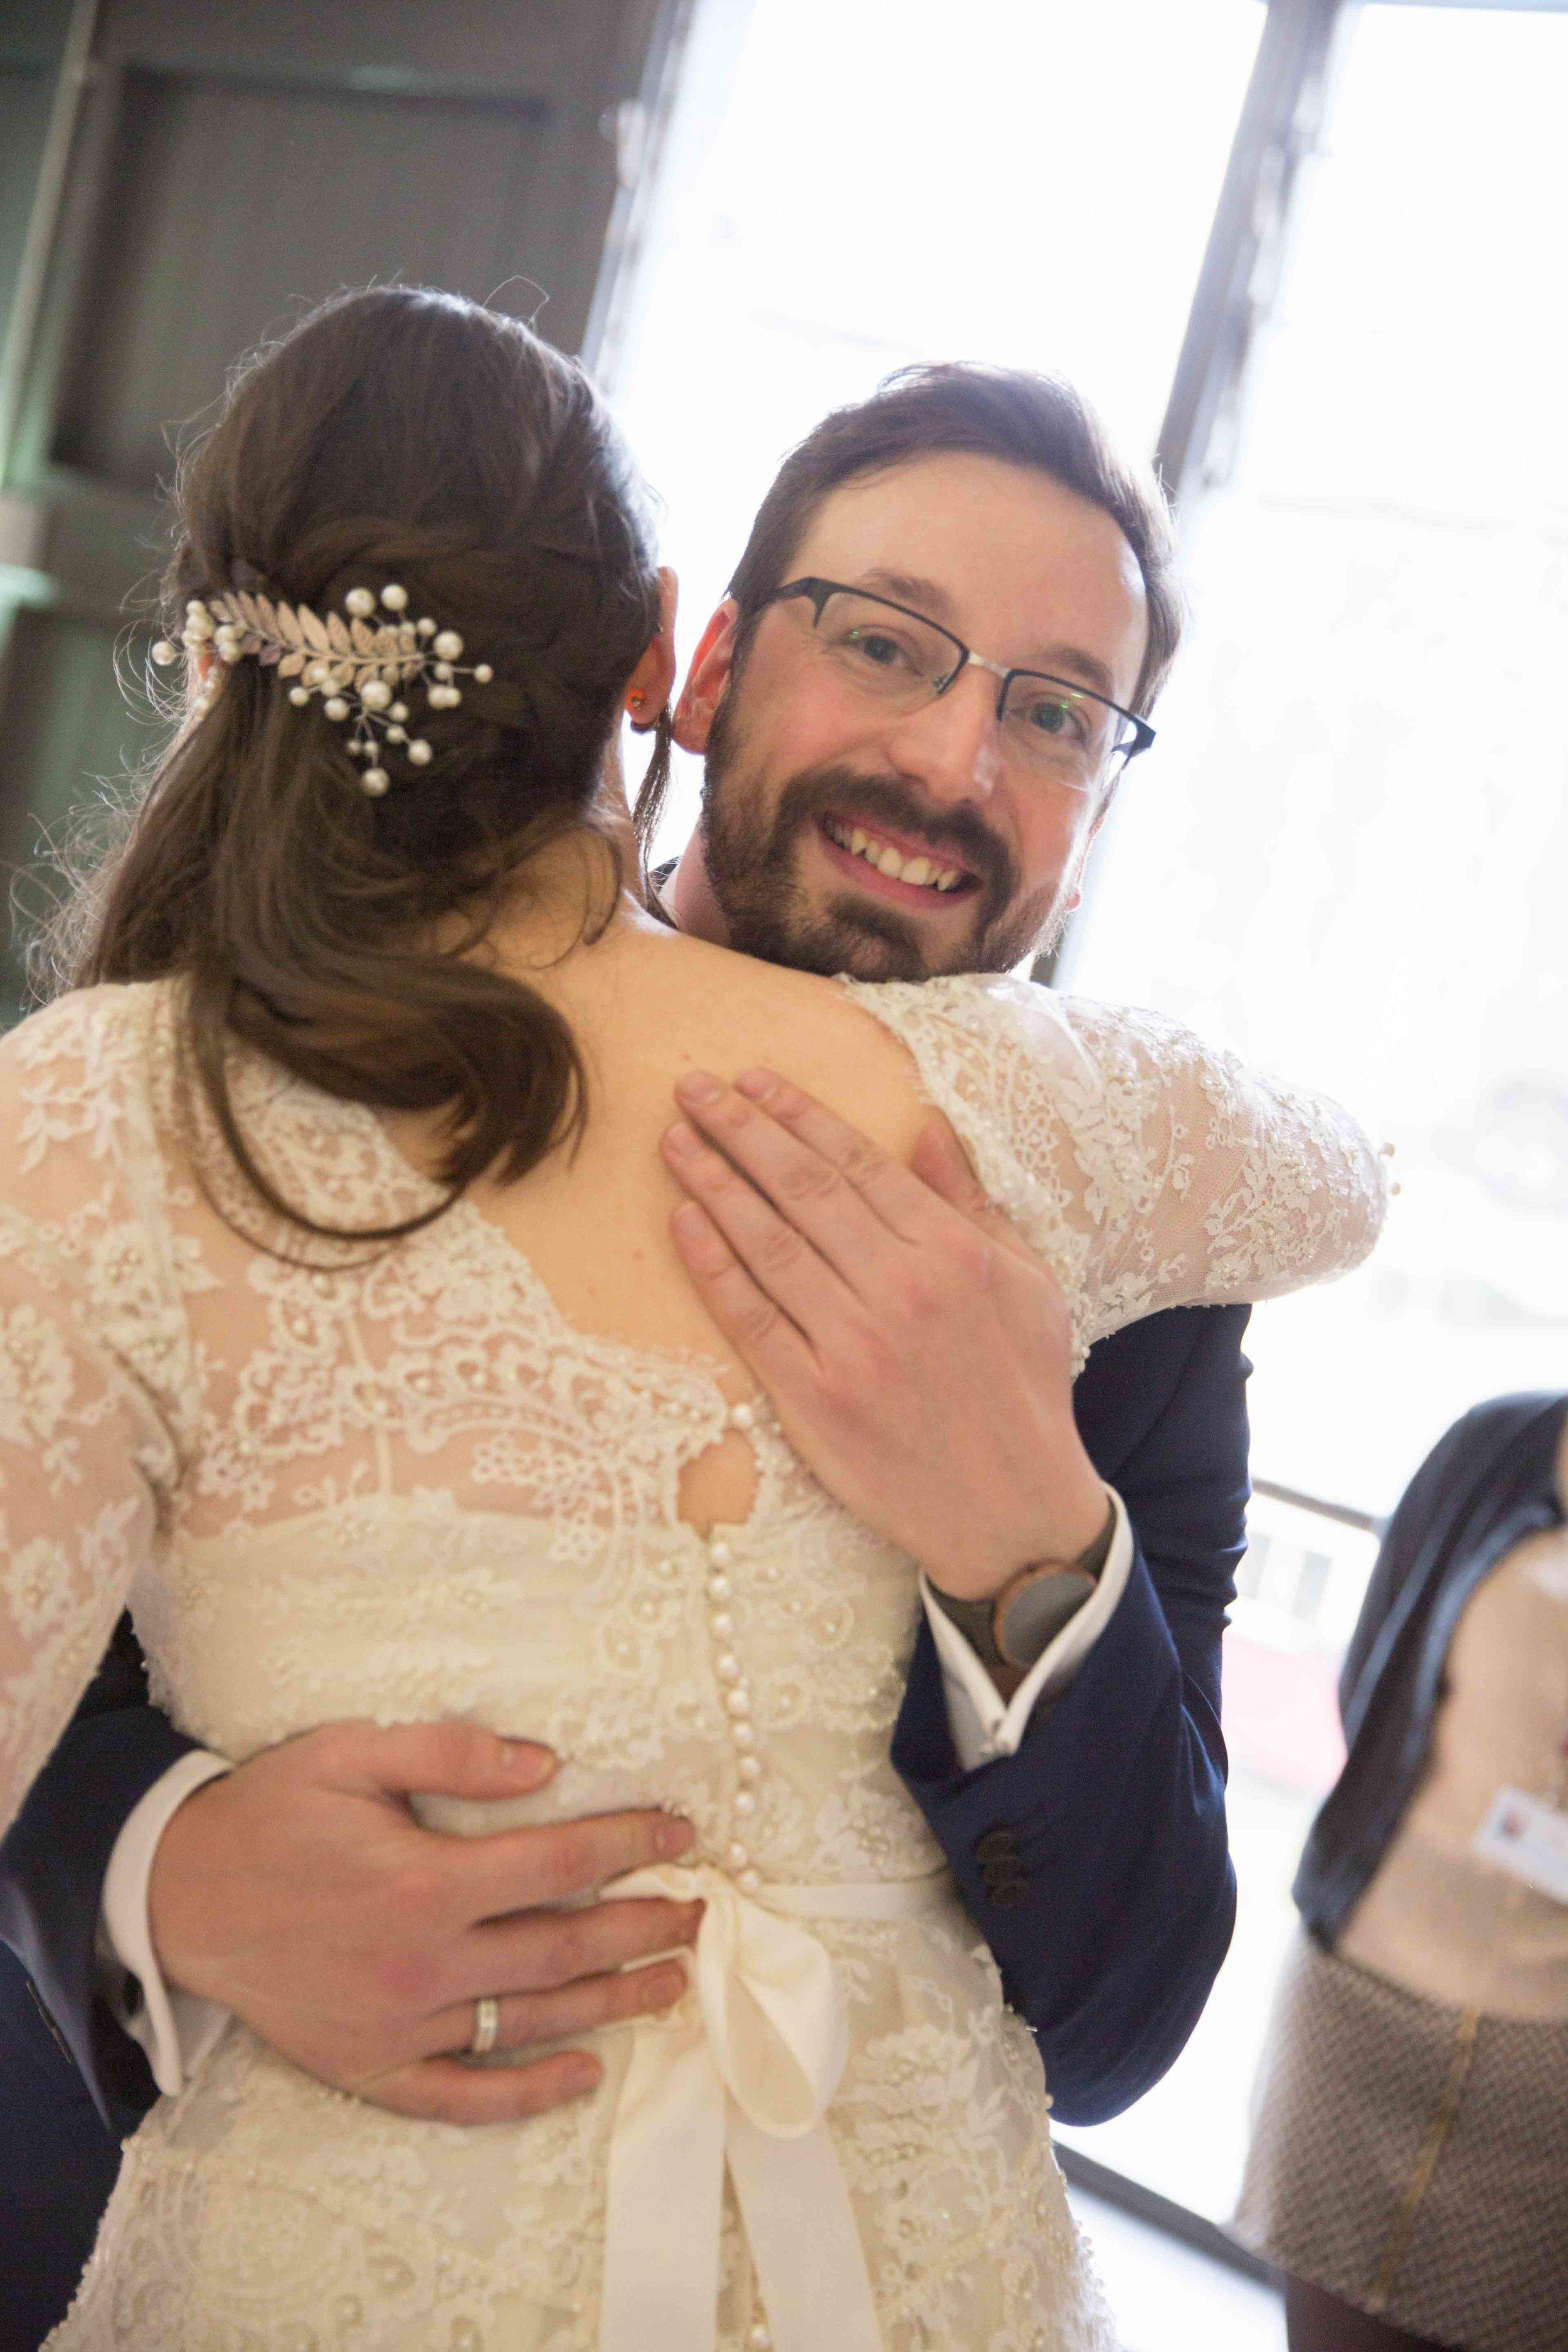 Adam & Faye - Wright Wedding Photography - Bristol Wedding Photographer -57.jpg